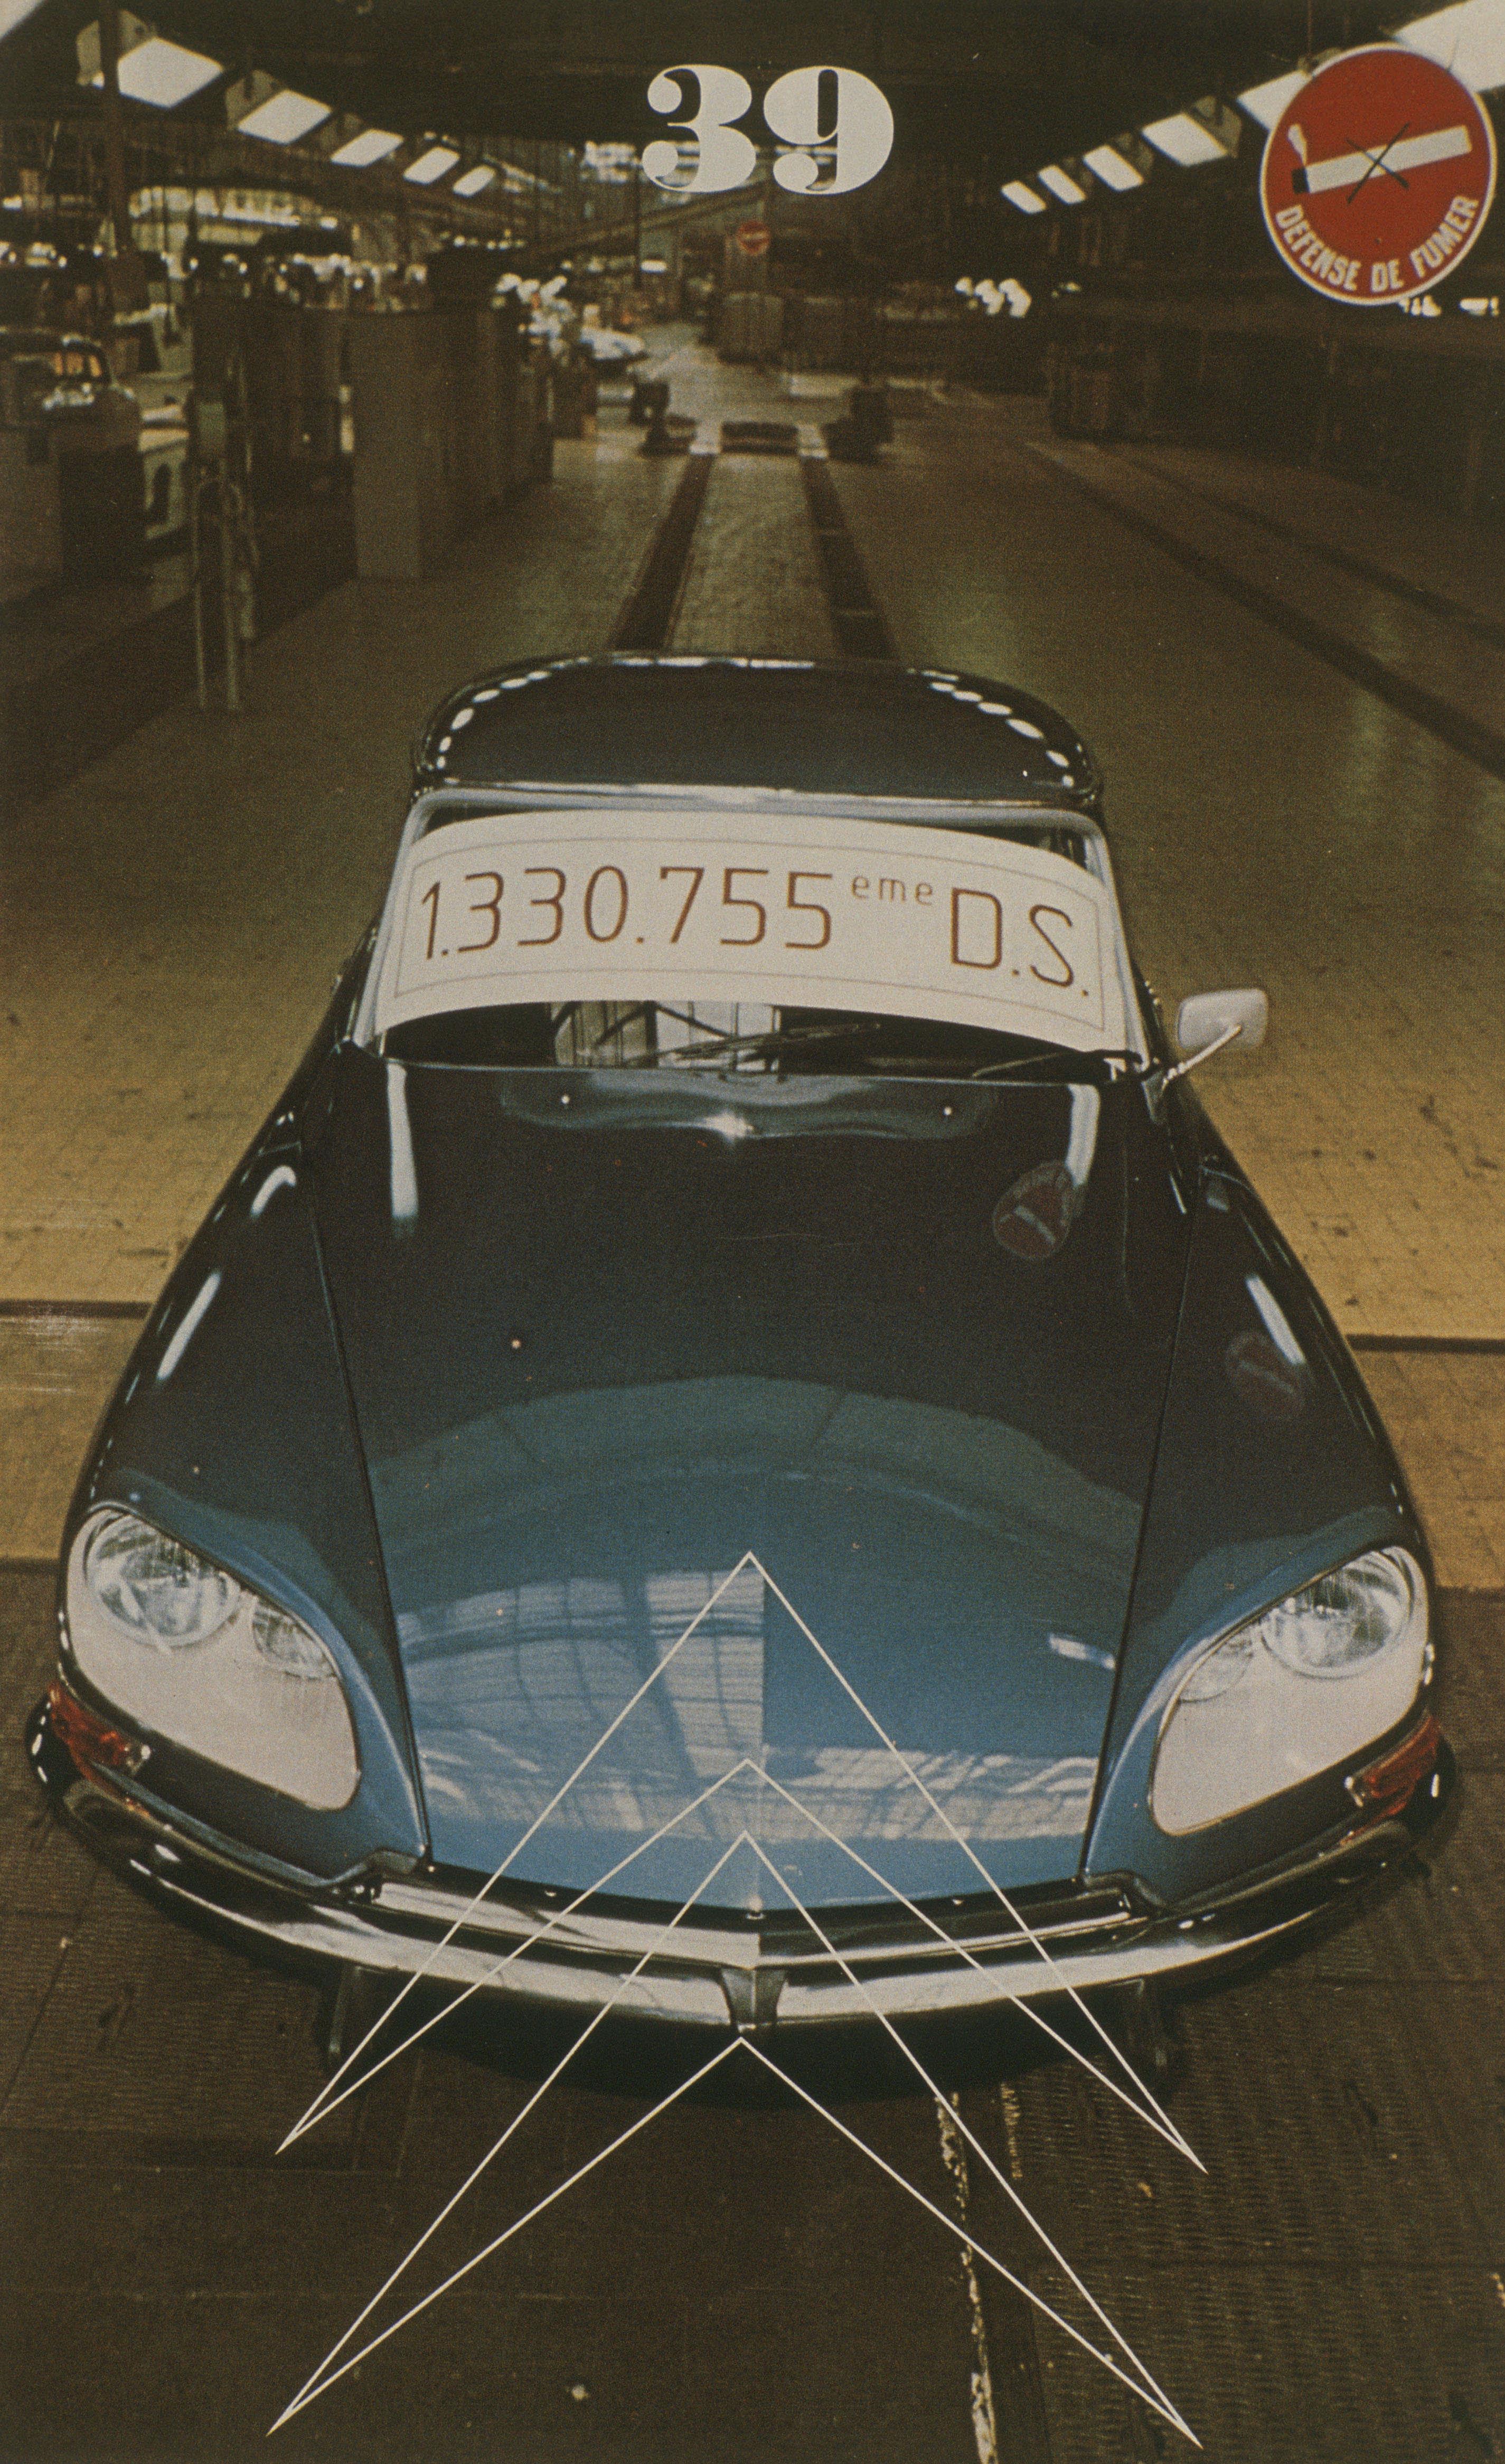 Double Chevron n°39 - 1974 - DS